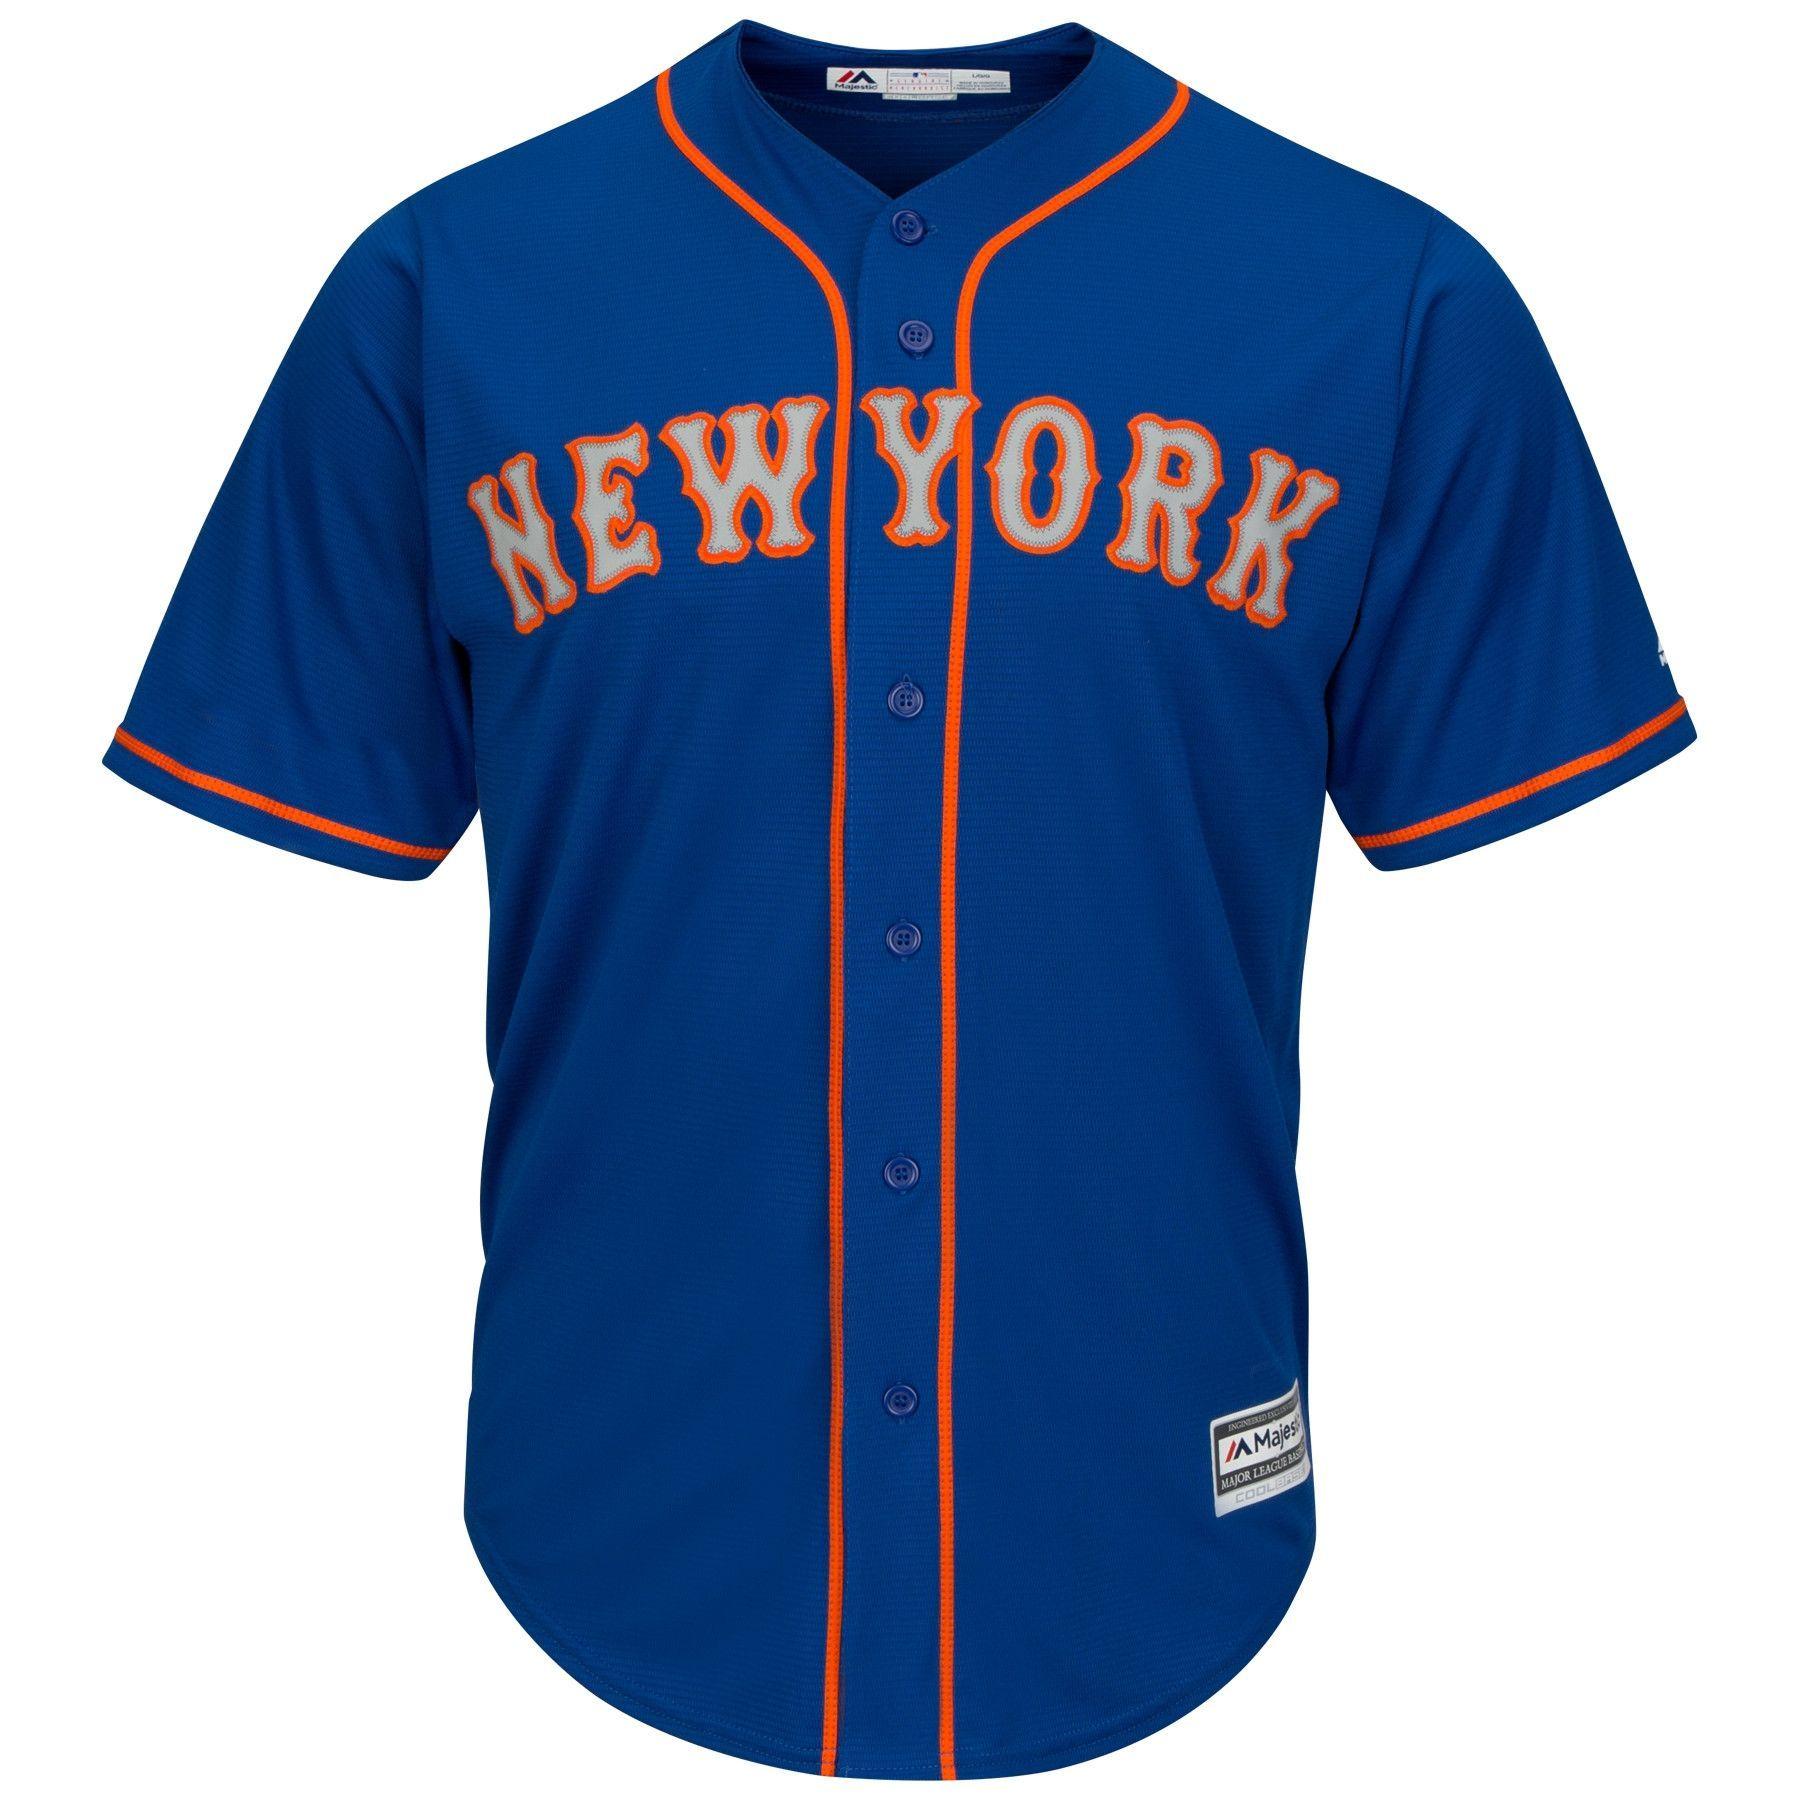 low cost 9313f d4fc9 New York Mets Cool Base MLB Trikot Alternate Road Blau